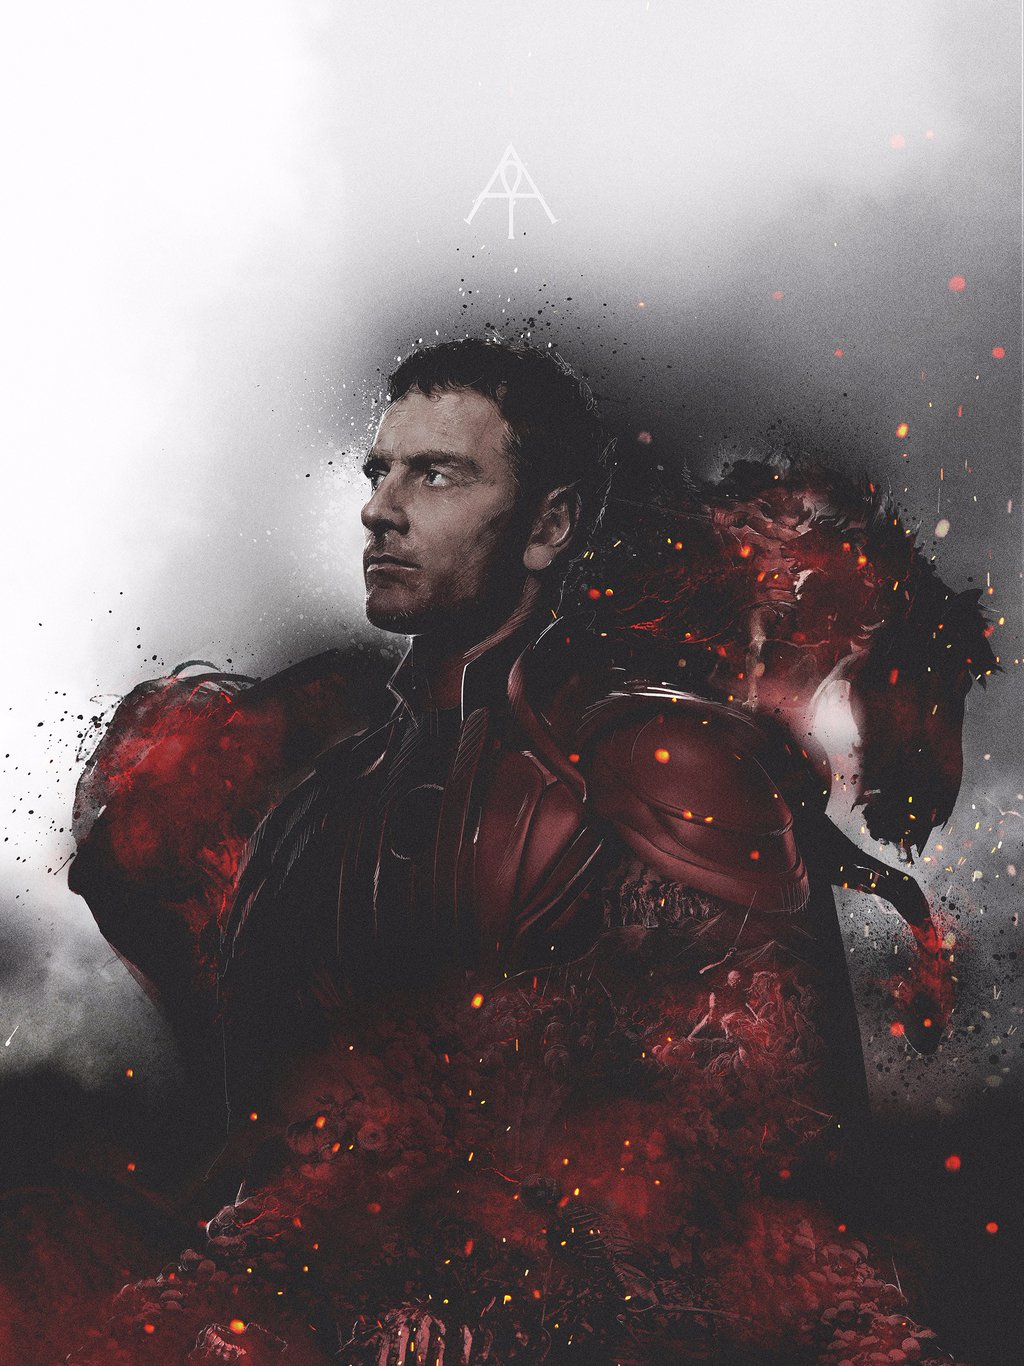 http://screenrant.com/wp-content/uploads/x-men-apocalypse-poster-magneto.jpeg